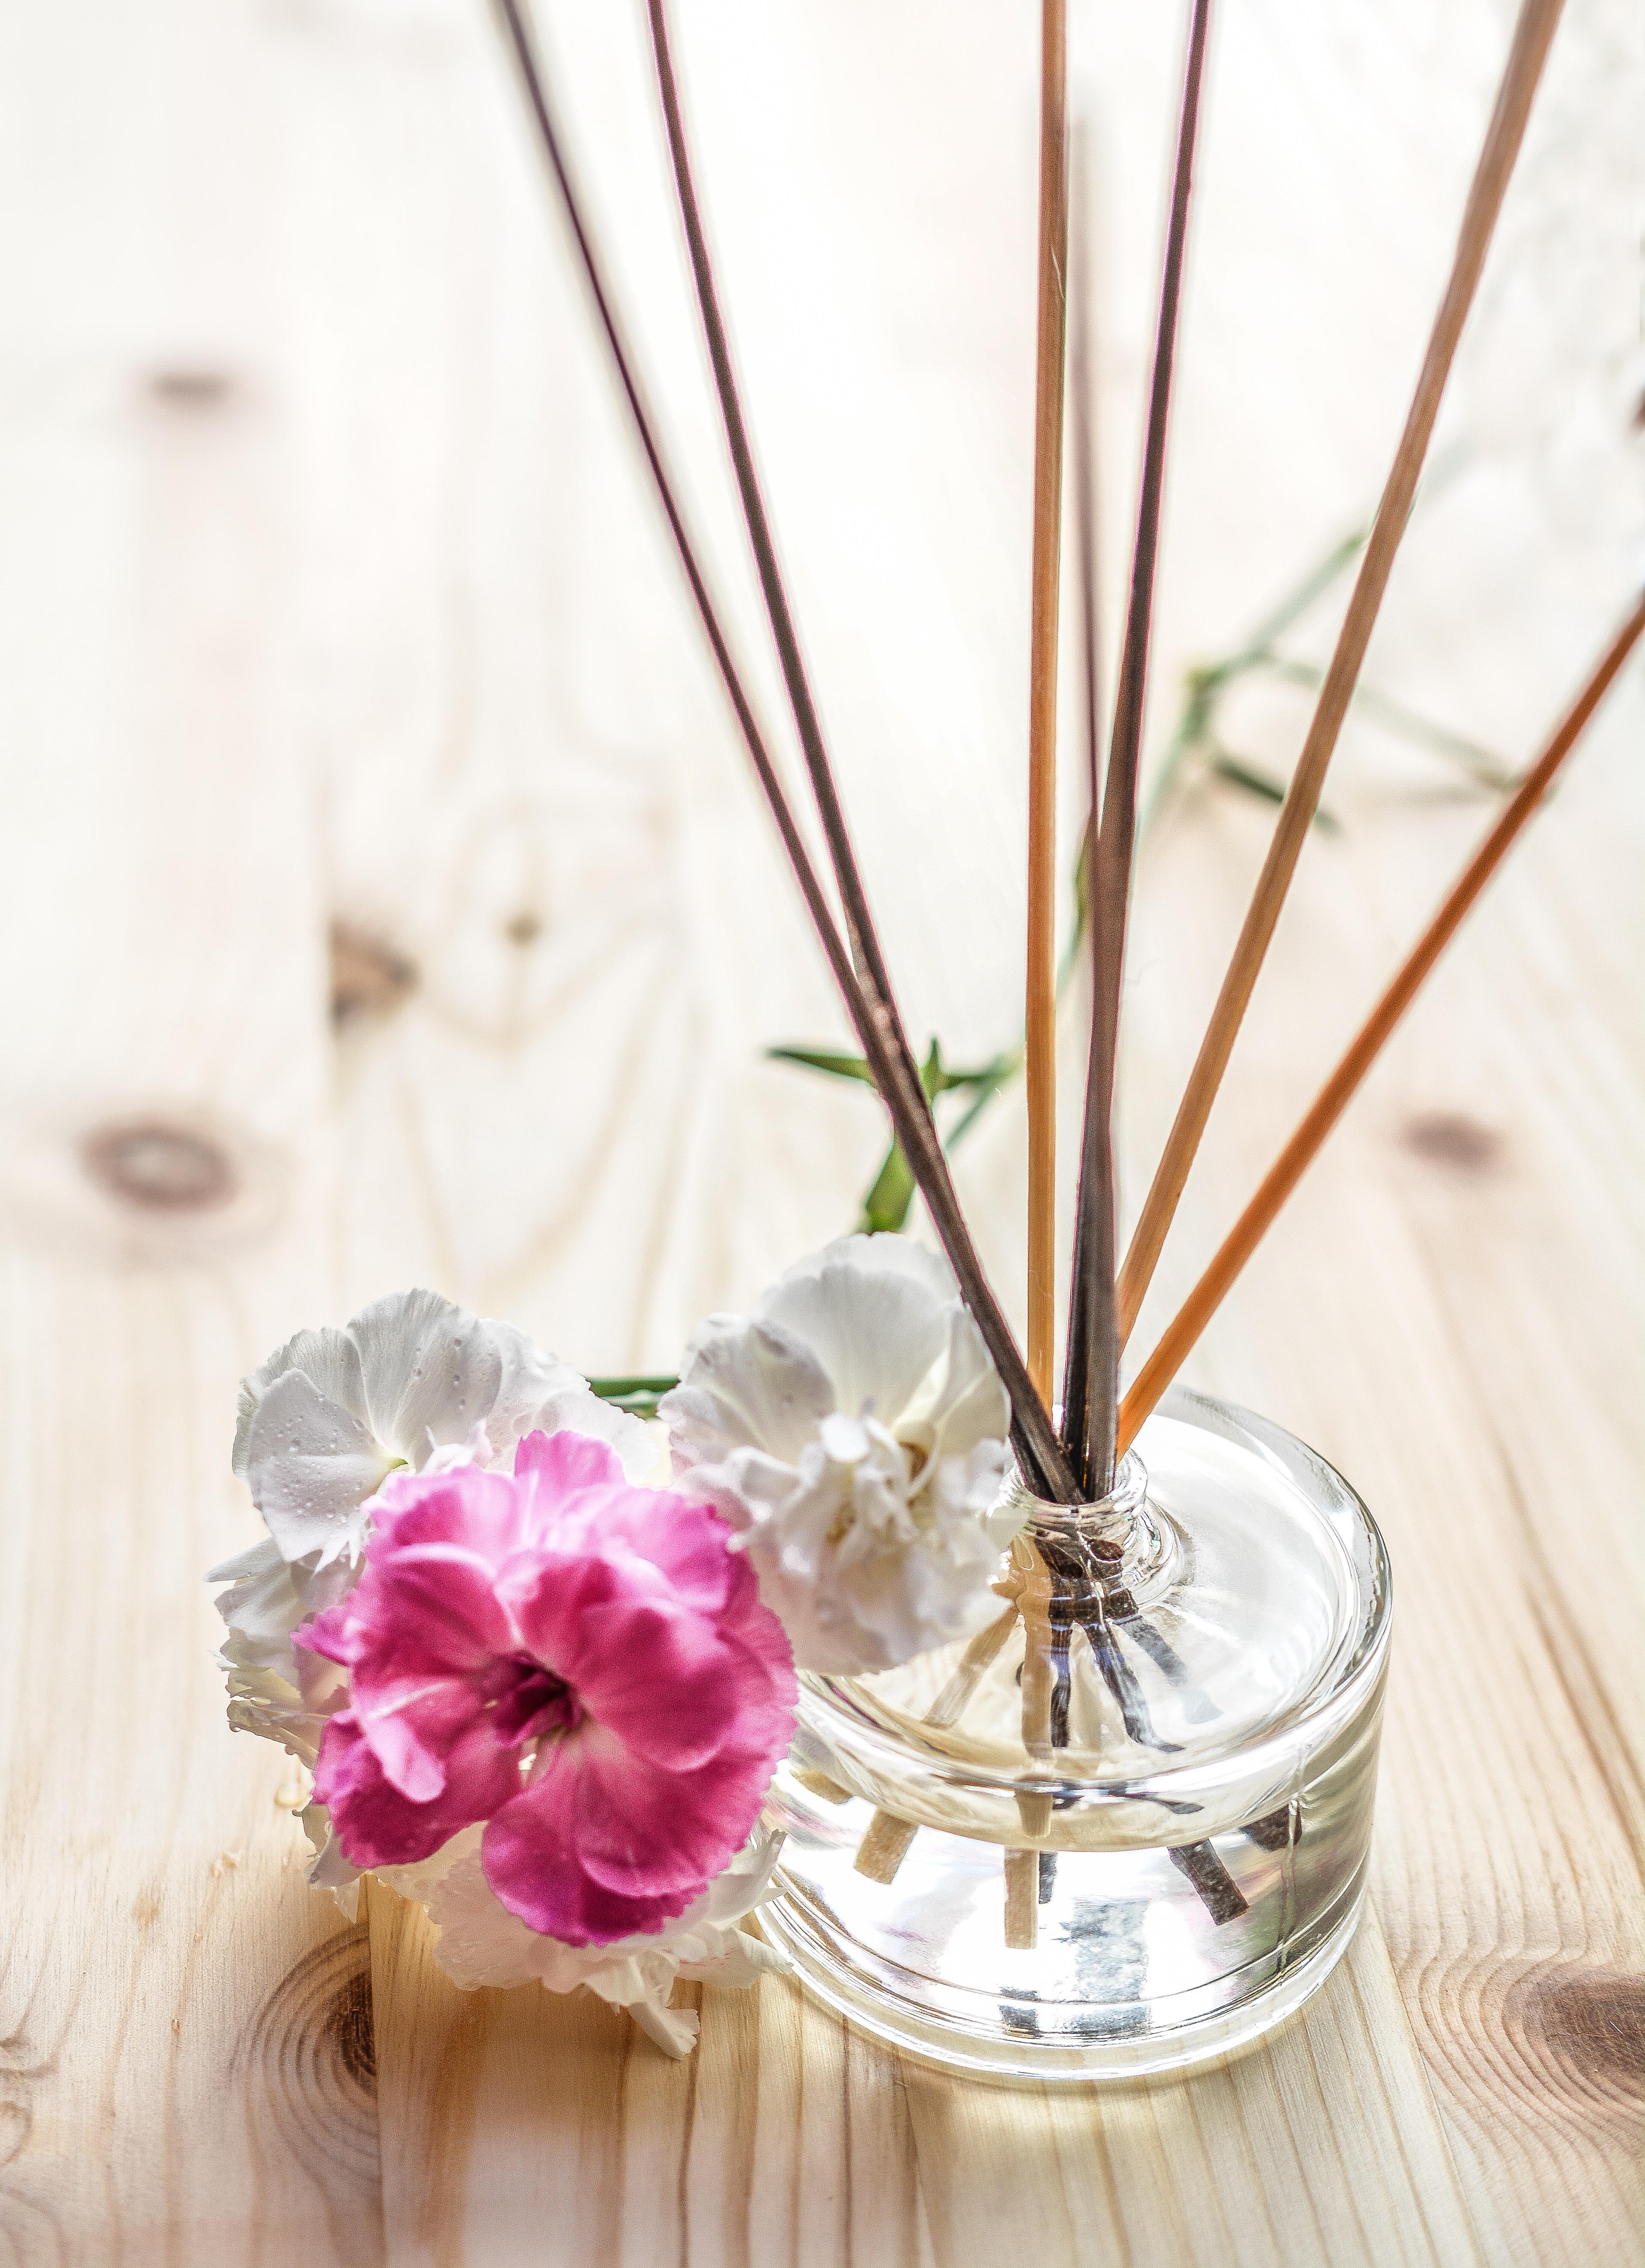 Glass Vase Fragrant Aroma Pottery & Glass